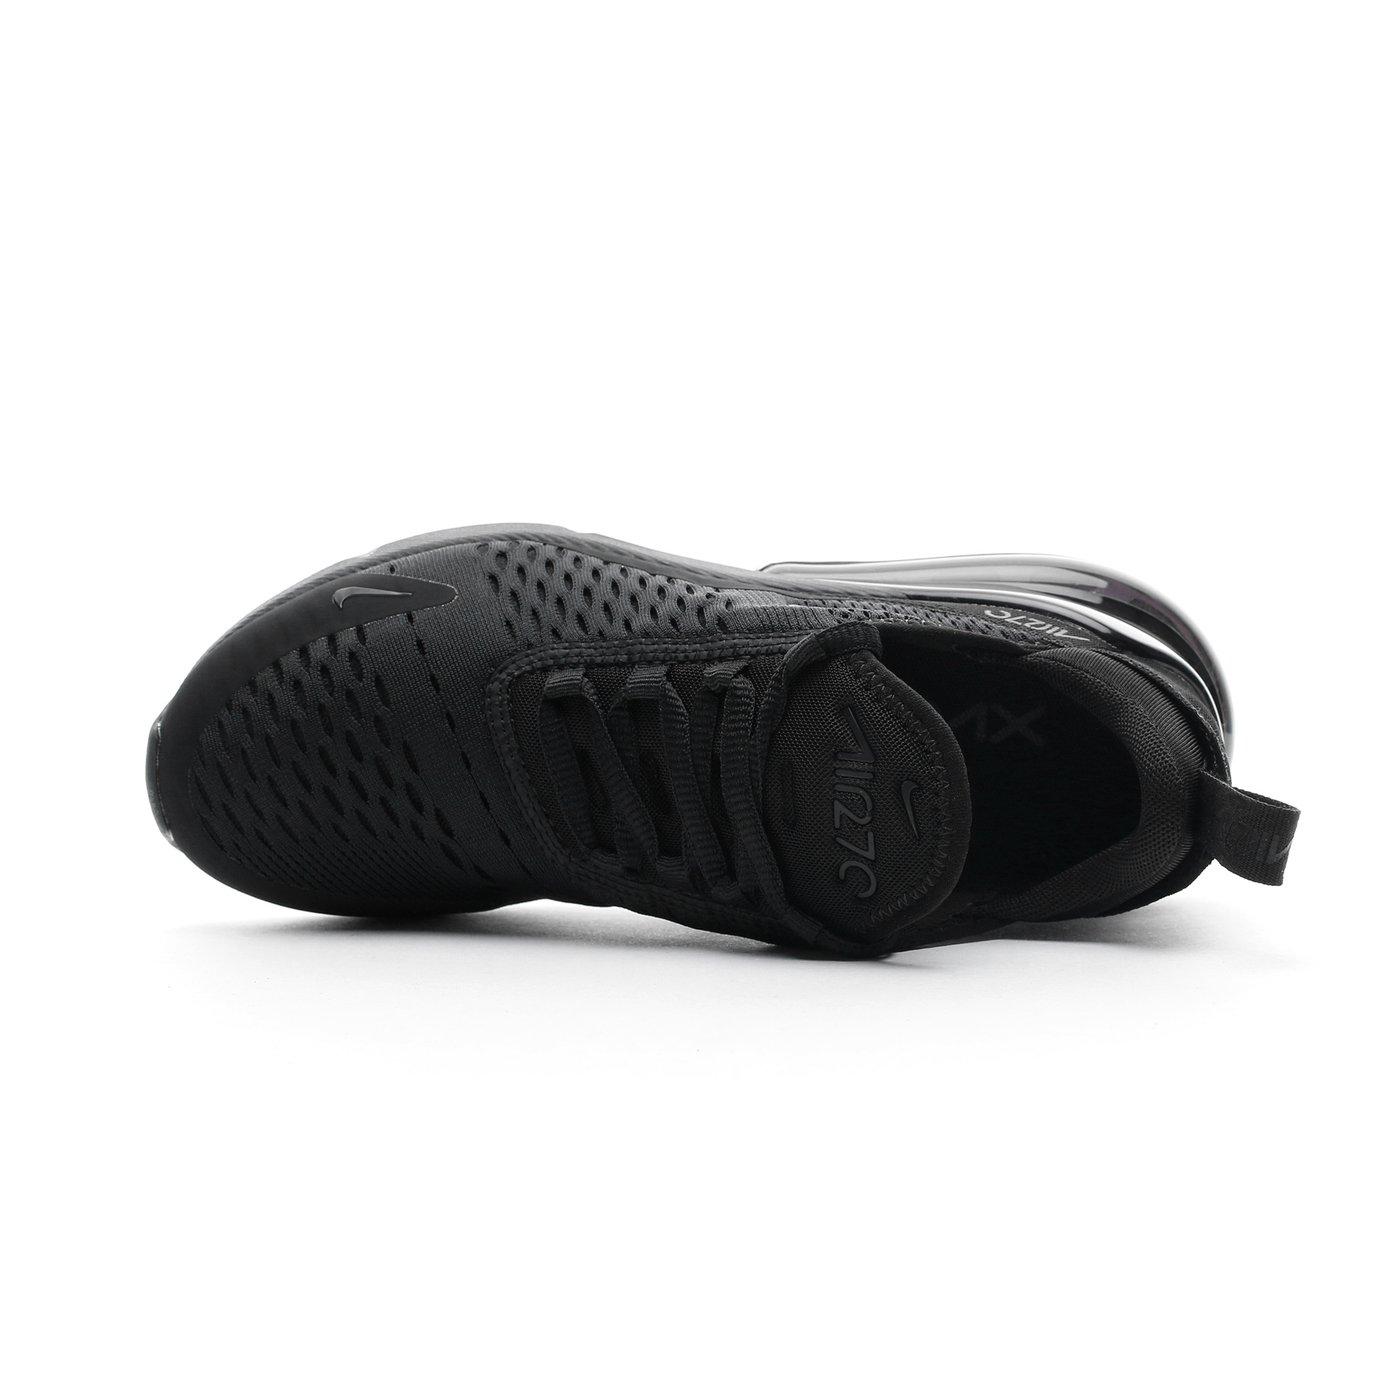 Nike Air Max 270 Kadın Siyah Spor Ayakkabı